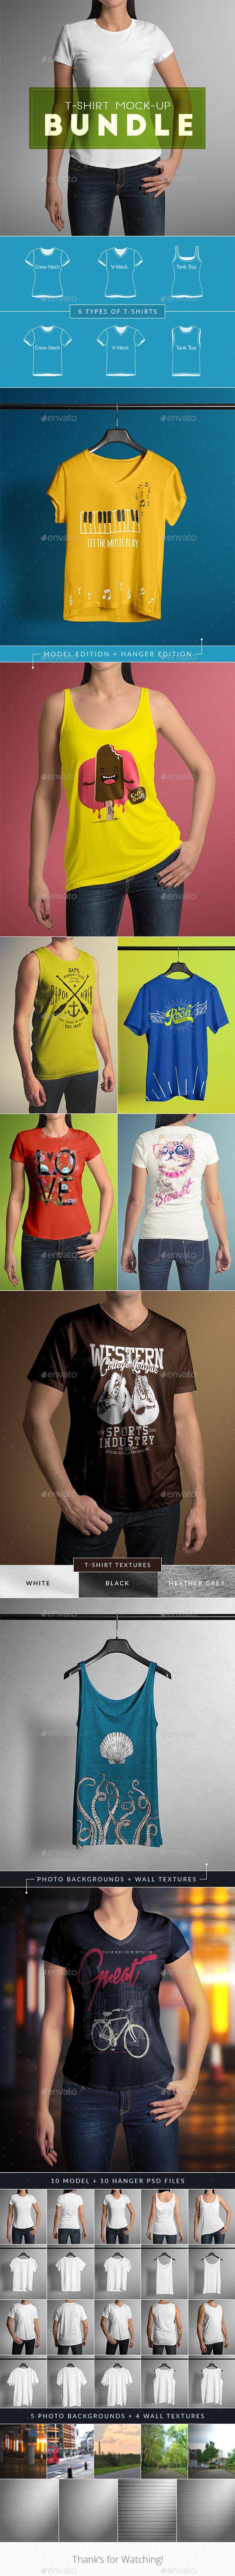 T shirt design jquery - T Shirt Design Jquery 57